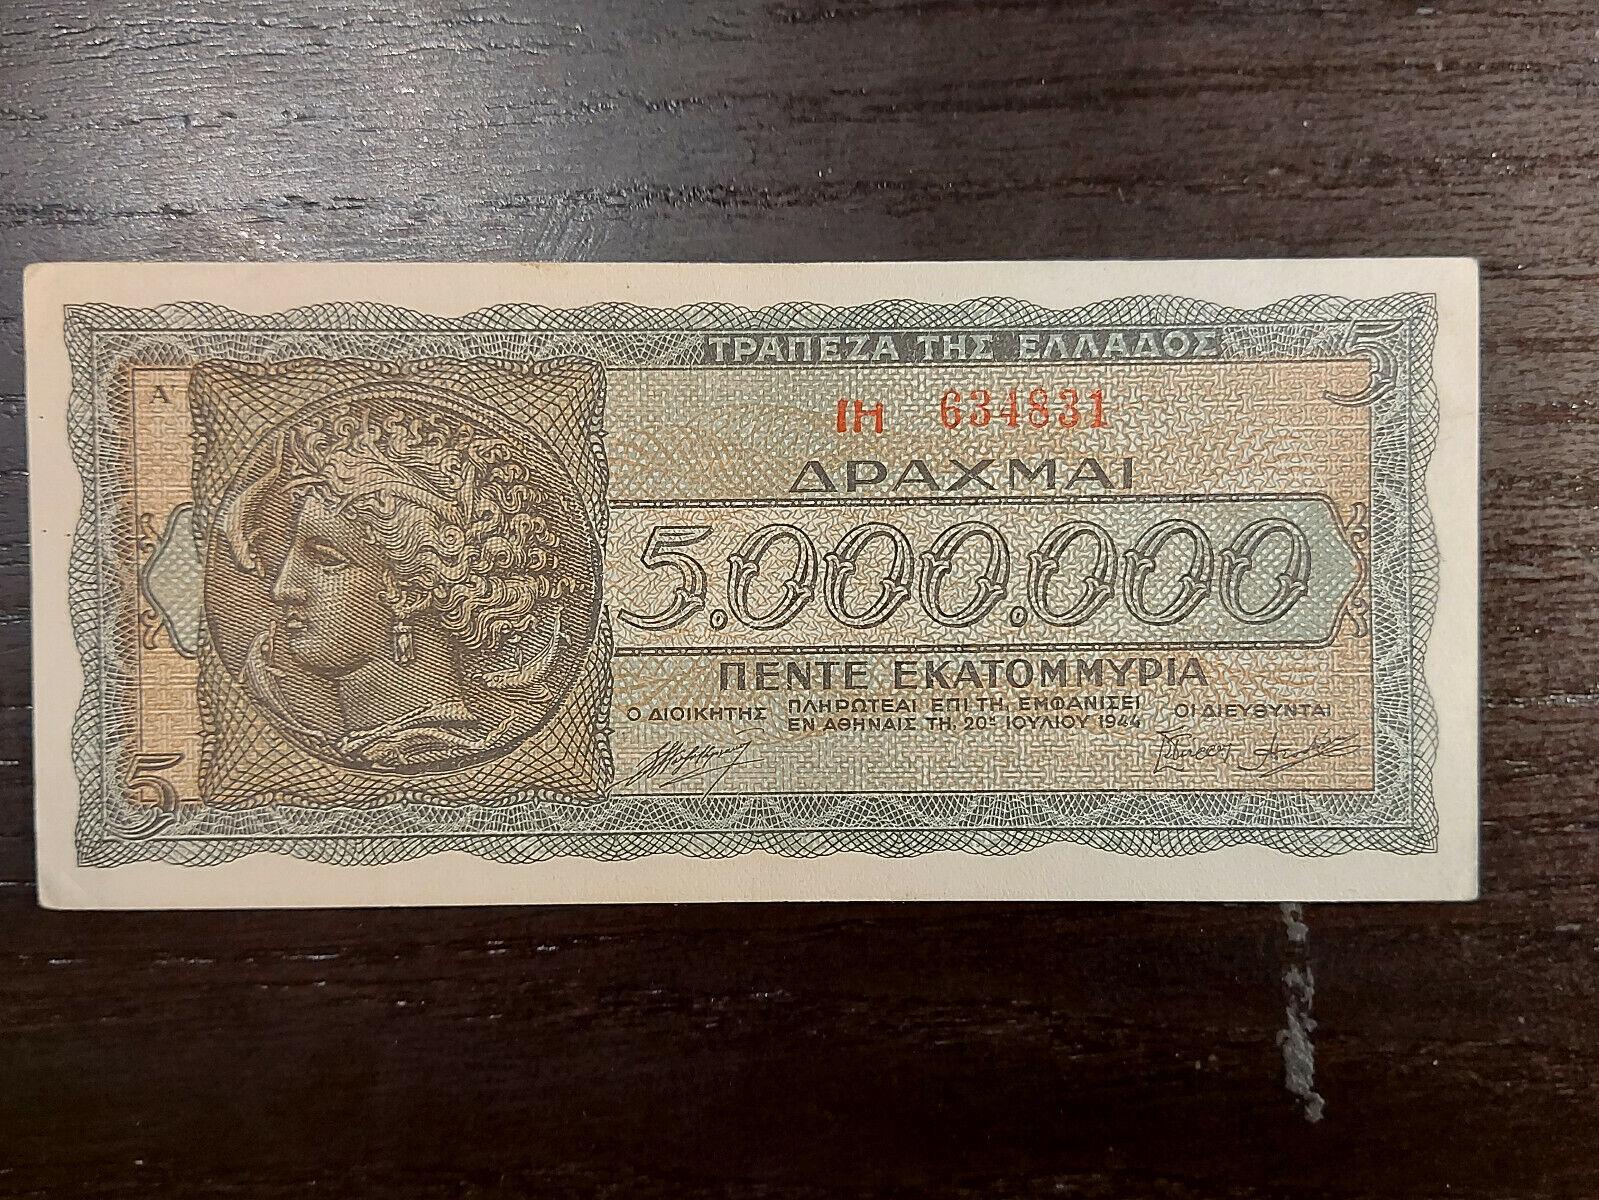 Greece 5 Million Drachmas 1944, P-128